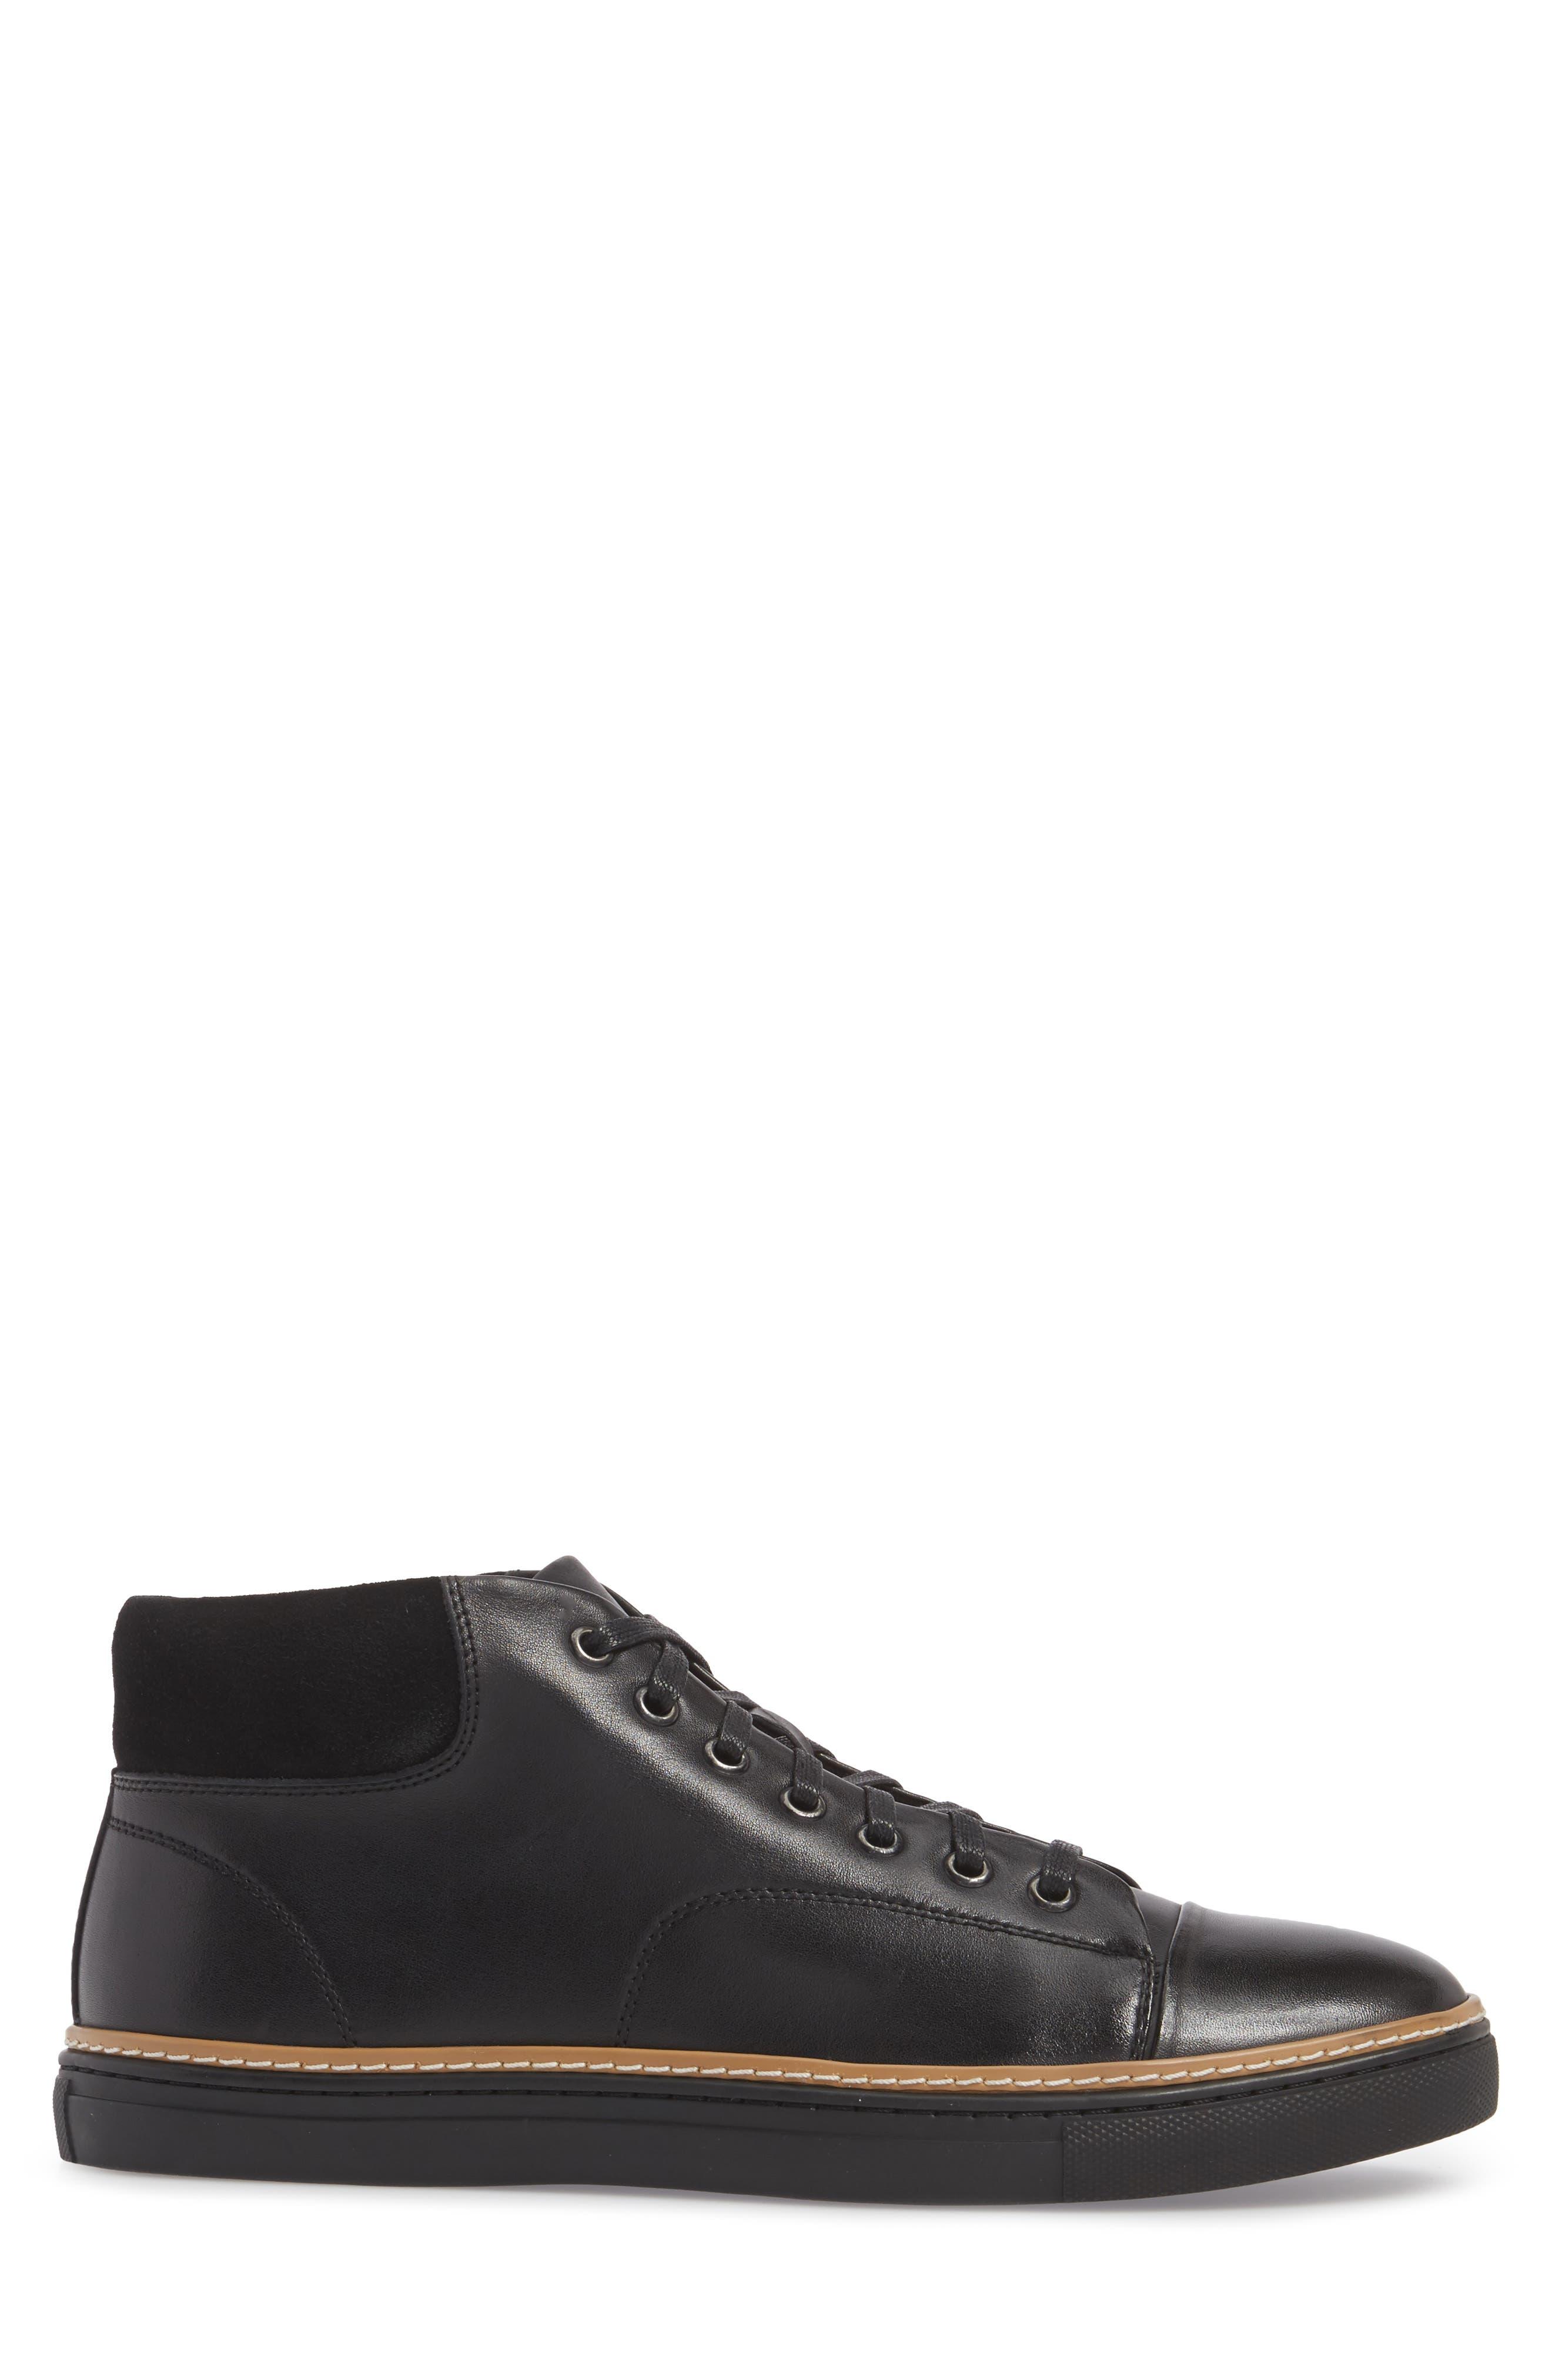 Grove Sneaker,                             Alternate thumbnail 3, color,                             BLACK LEATHER